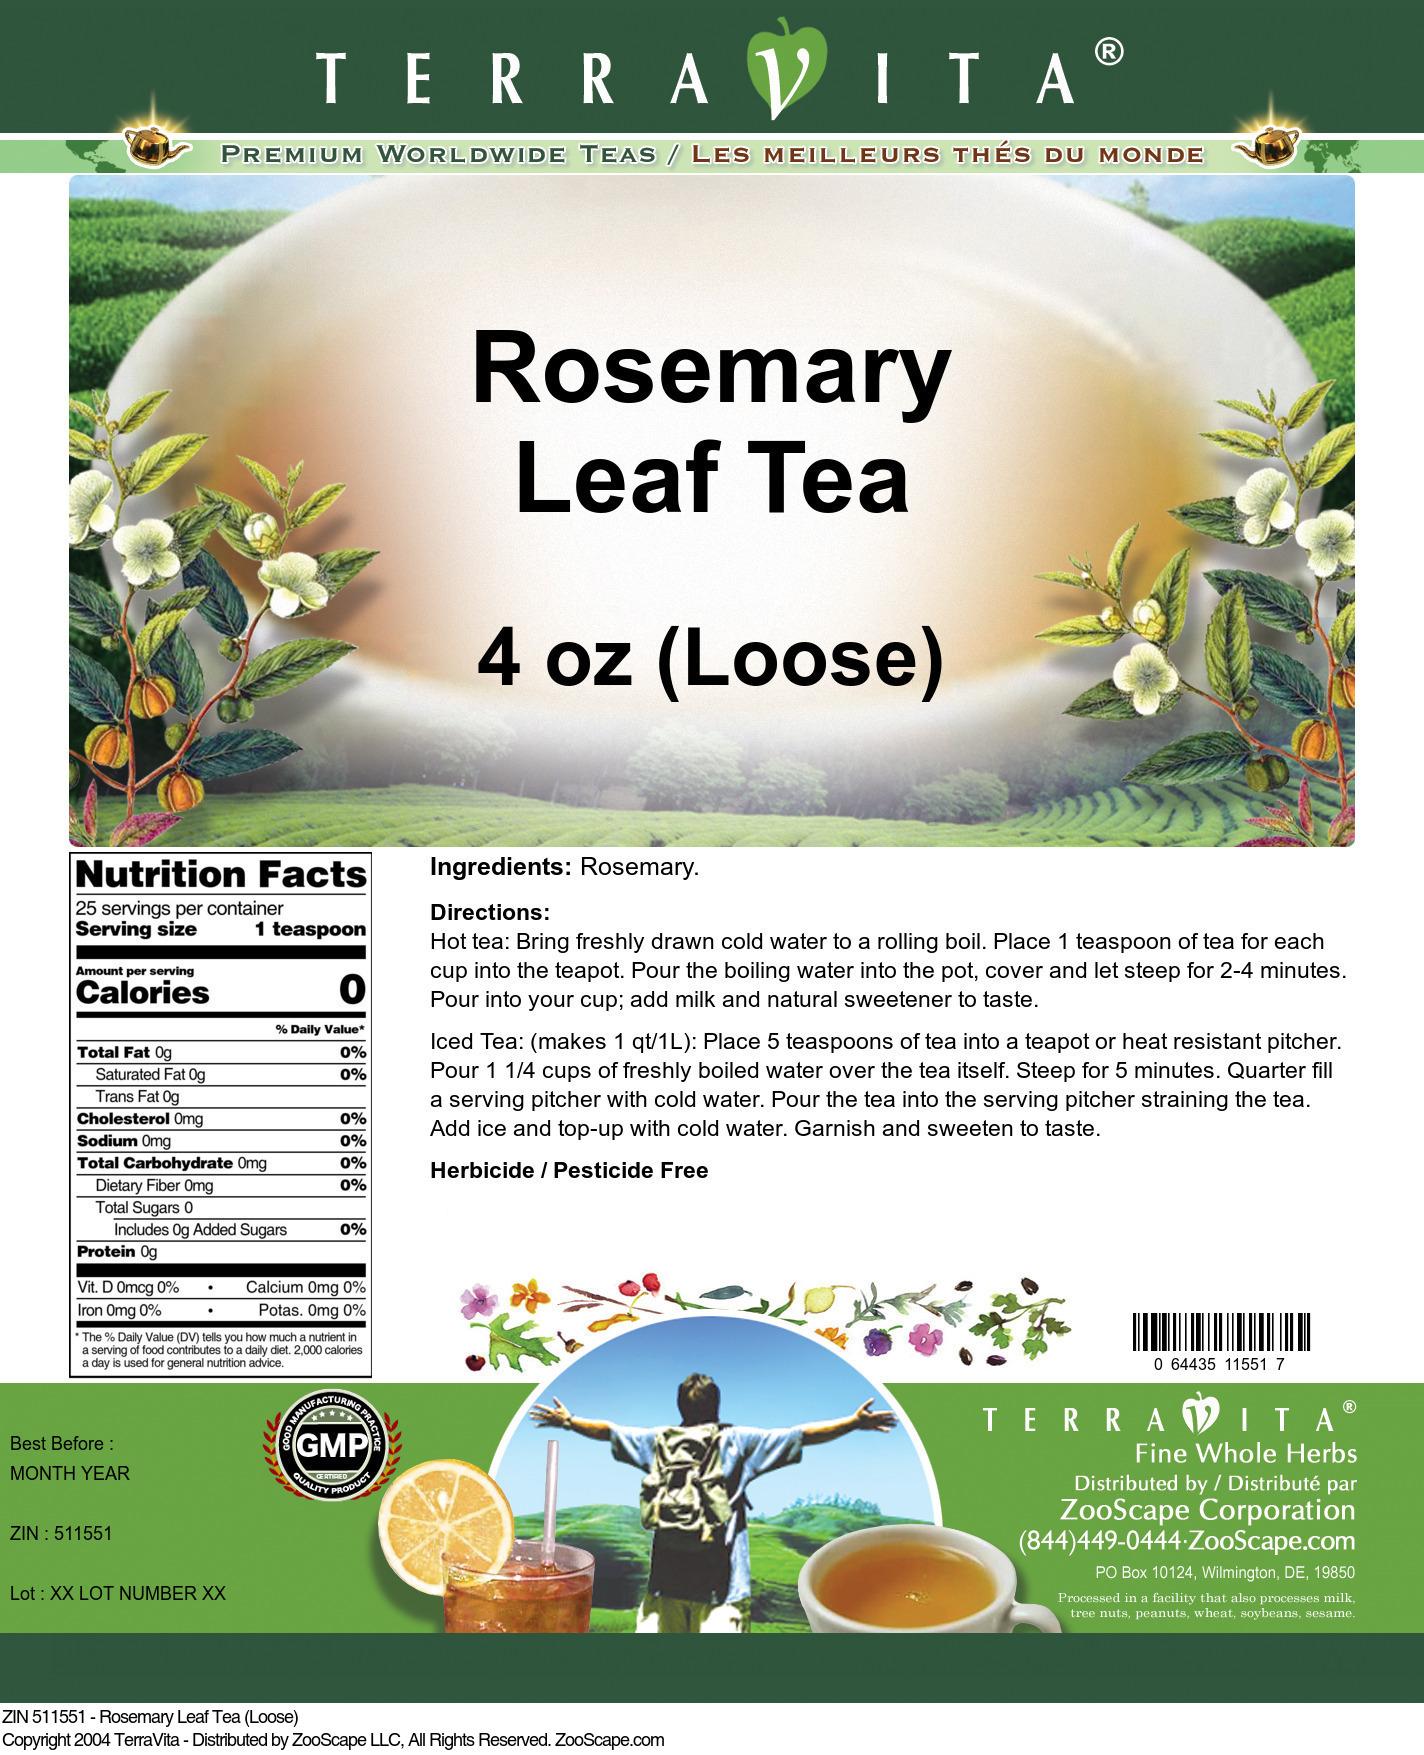 Rosemary Leaf